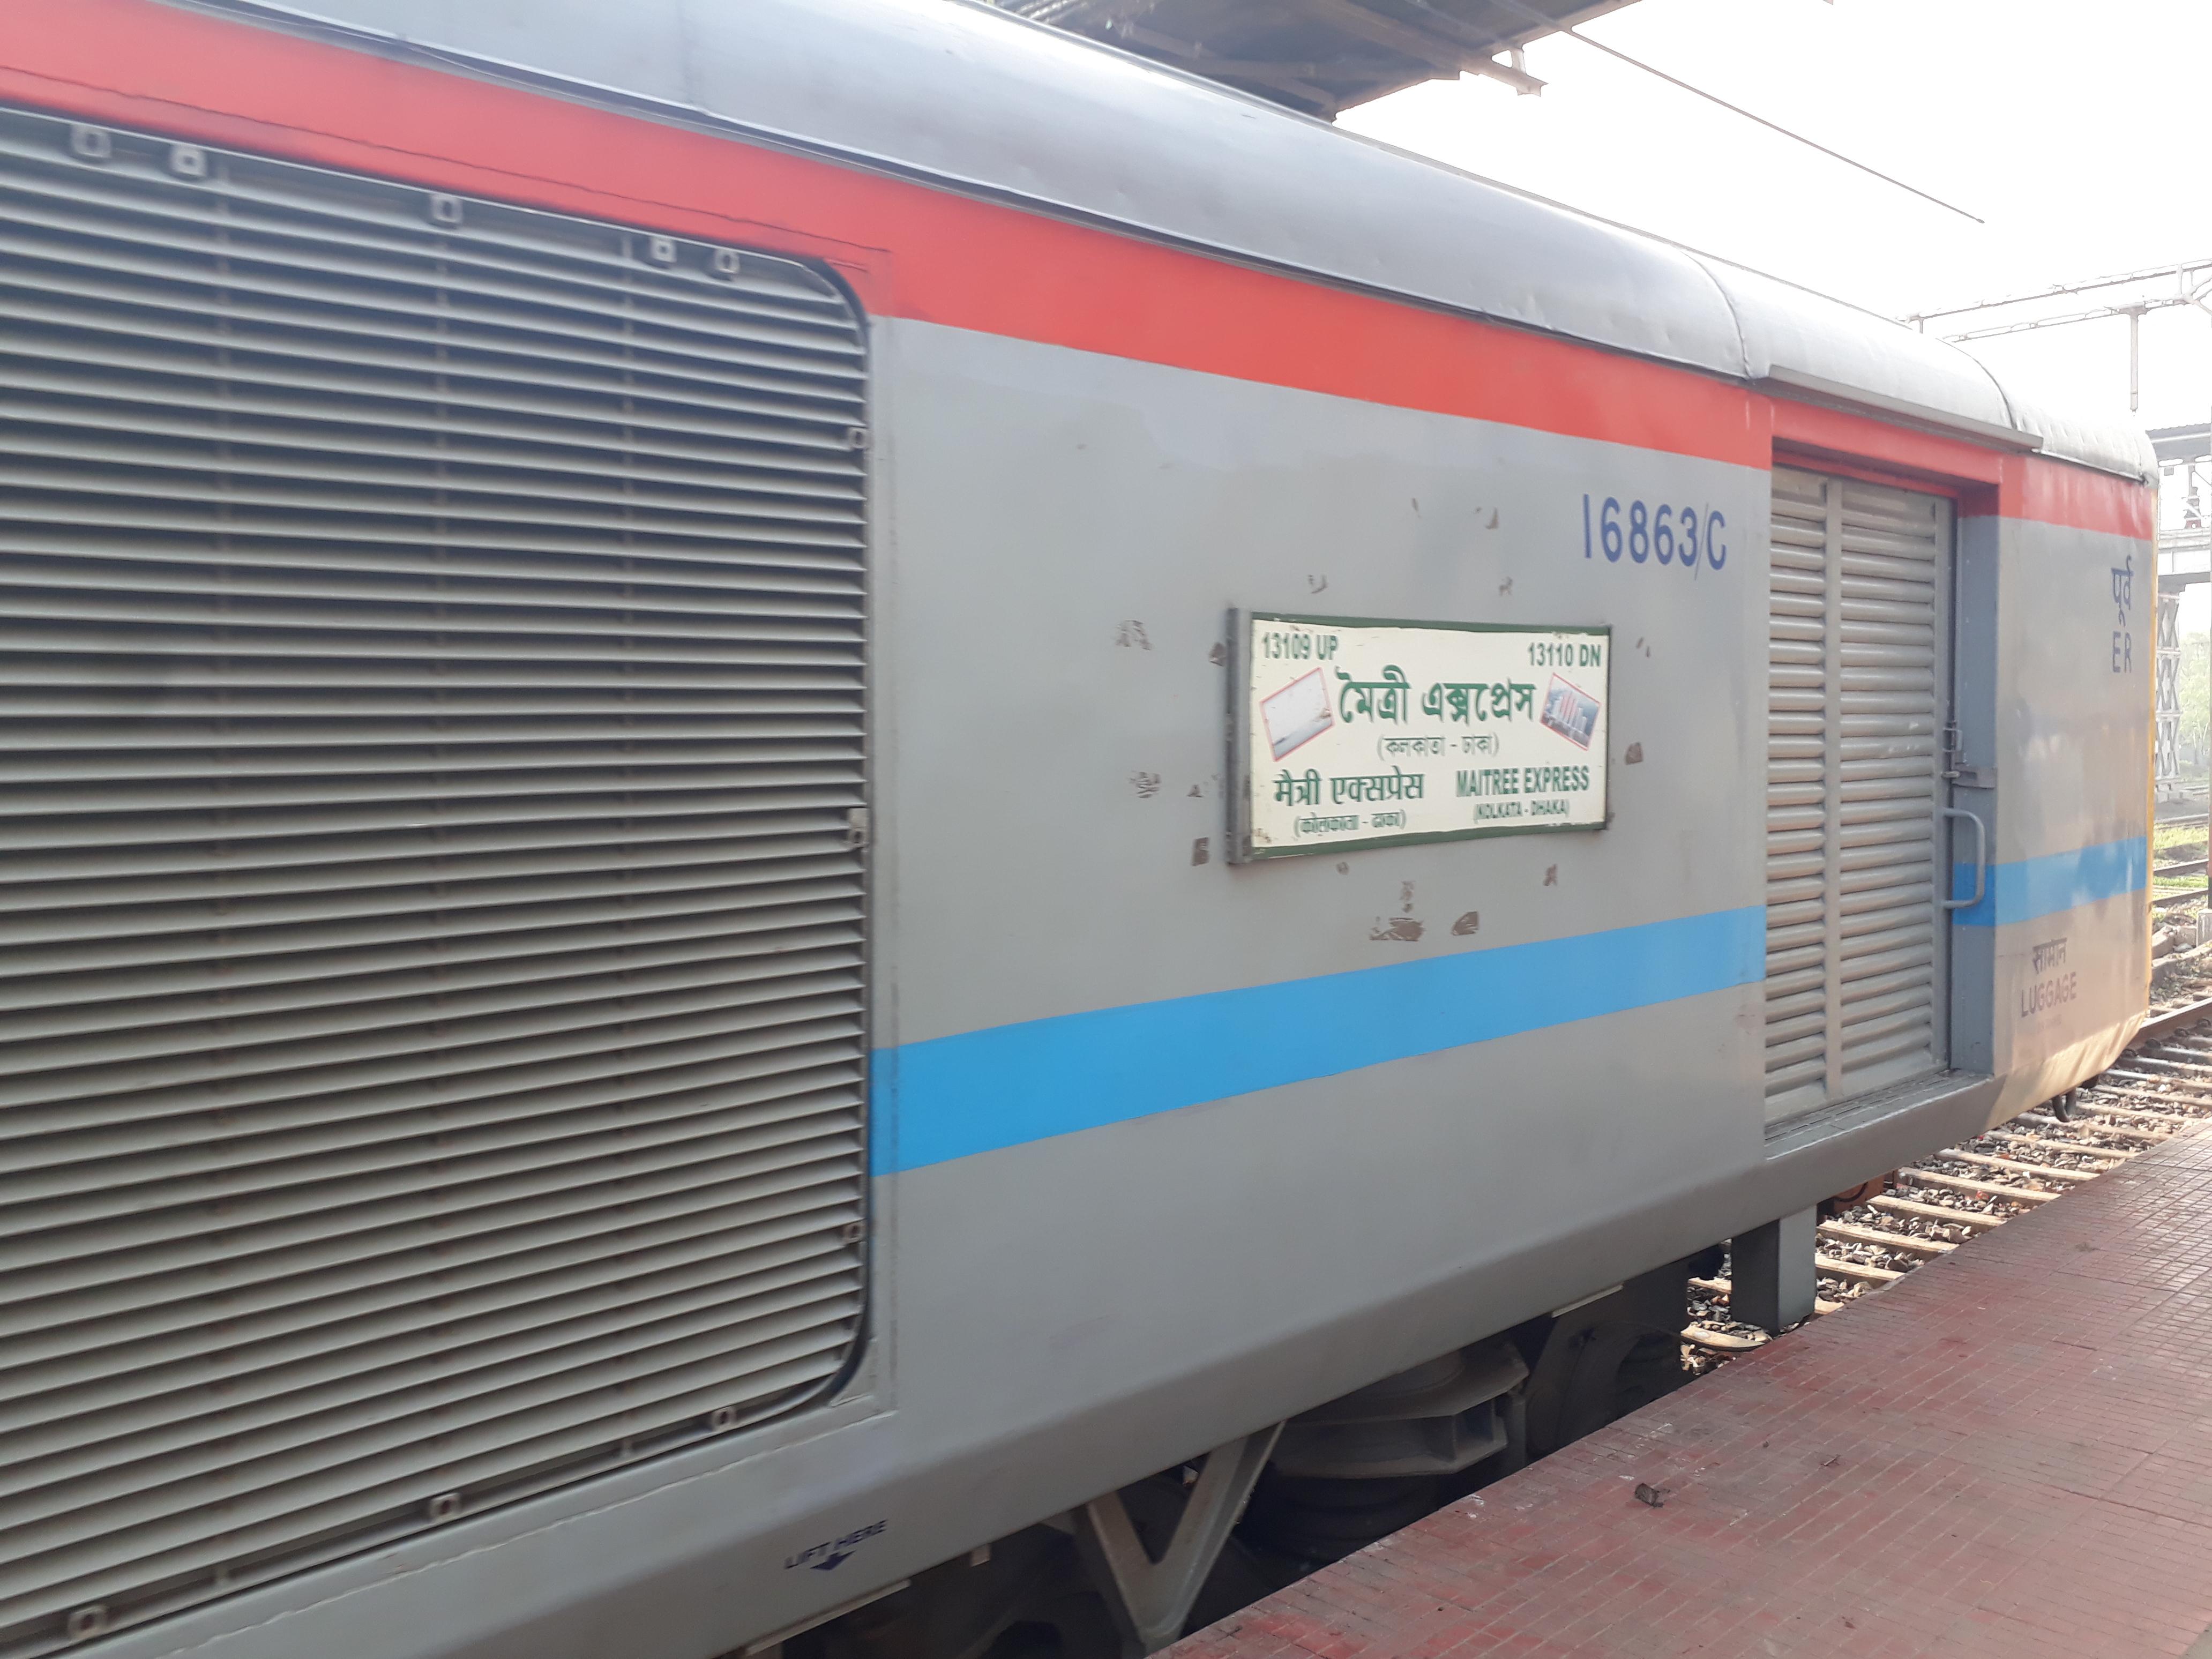 Dhaka To Kolkata Train Schedule & Ticket Price 2019 | bd